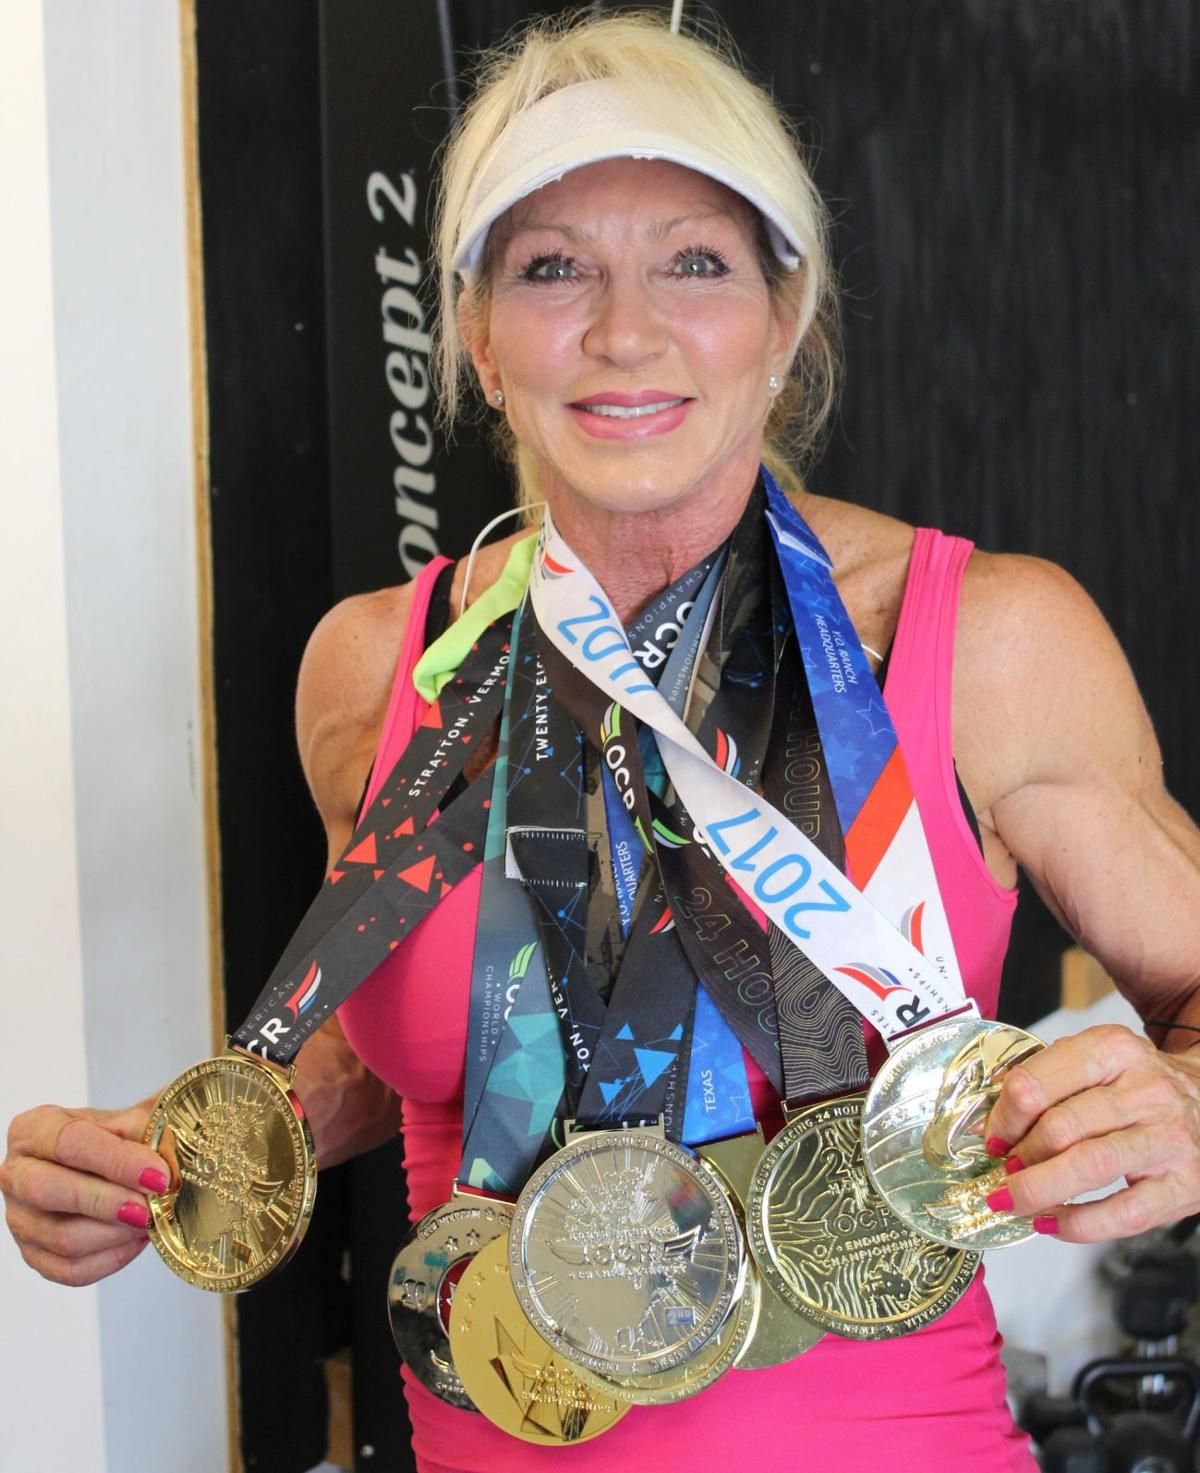 Heidi Williams- not your typical senior citizen